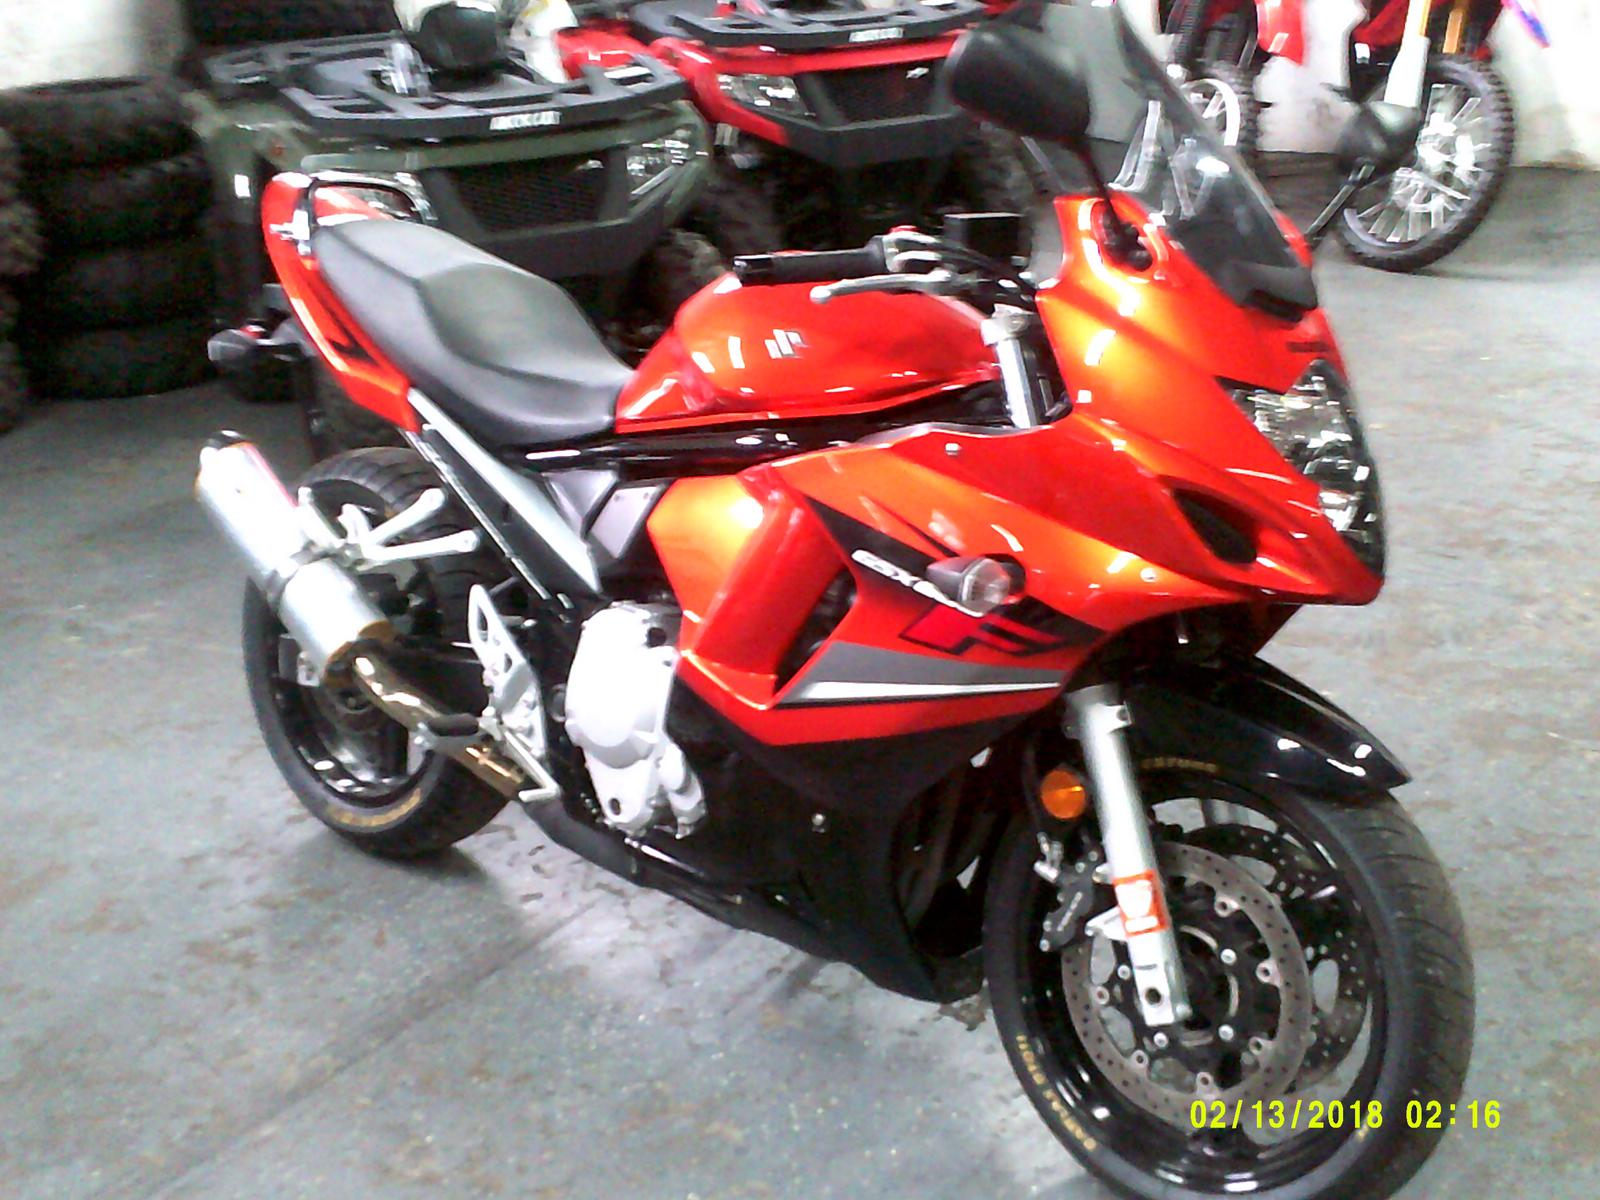 Street Bike 800 675 9218 From Dohm Cycles 2009 Yamaha Royal Star Venture Starting System Circuit Suzuki Gsx650f